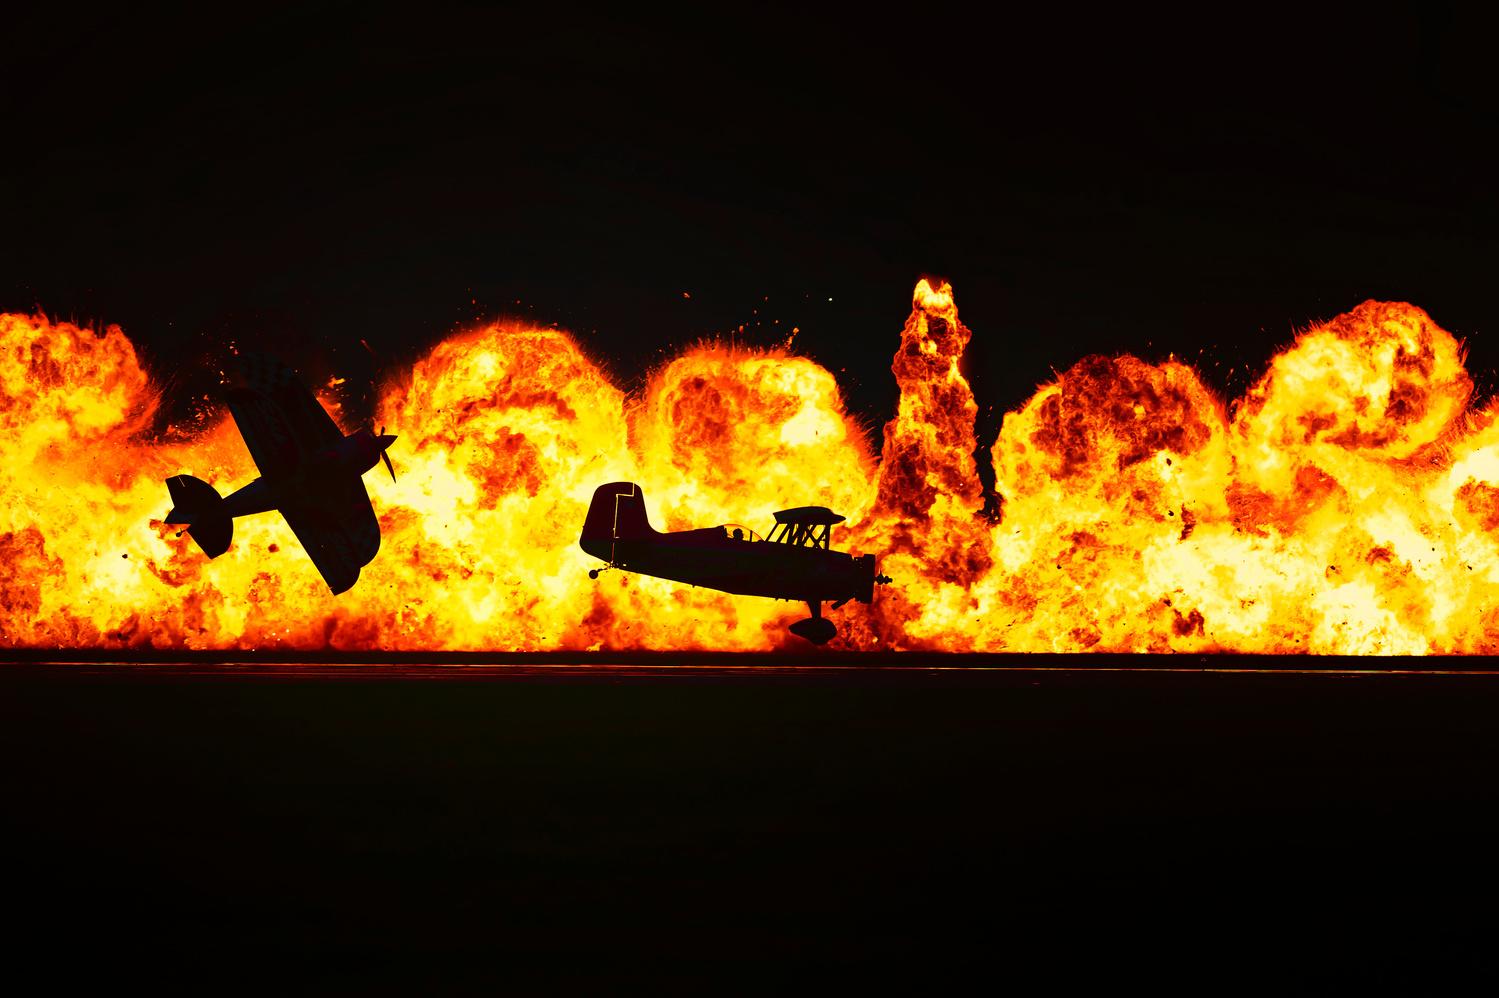 Prometheus through the Fire by Angelo Bufalino